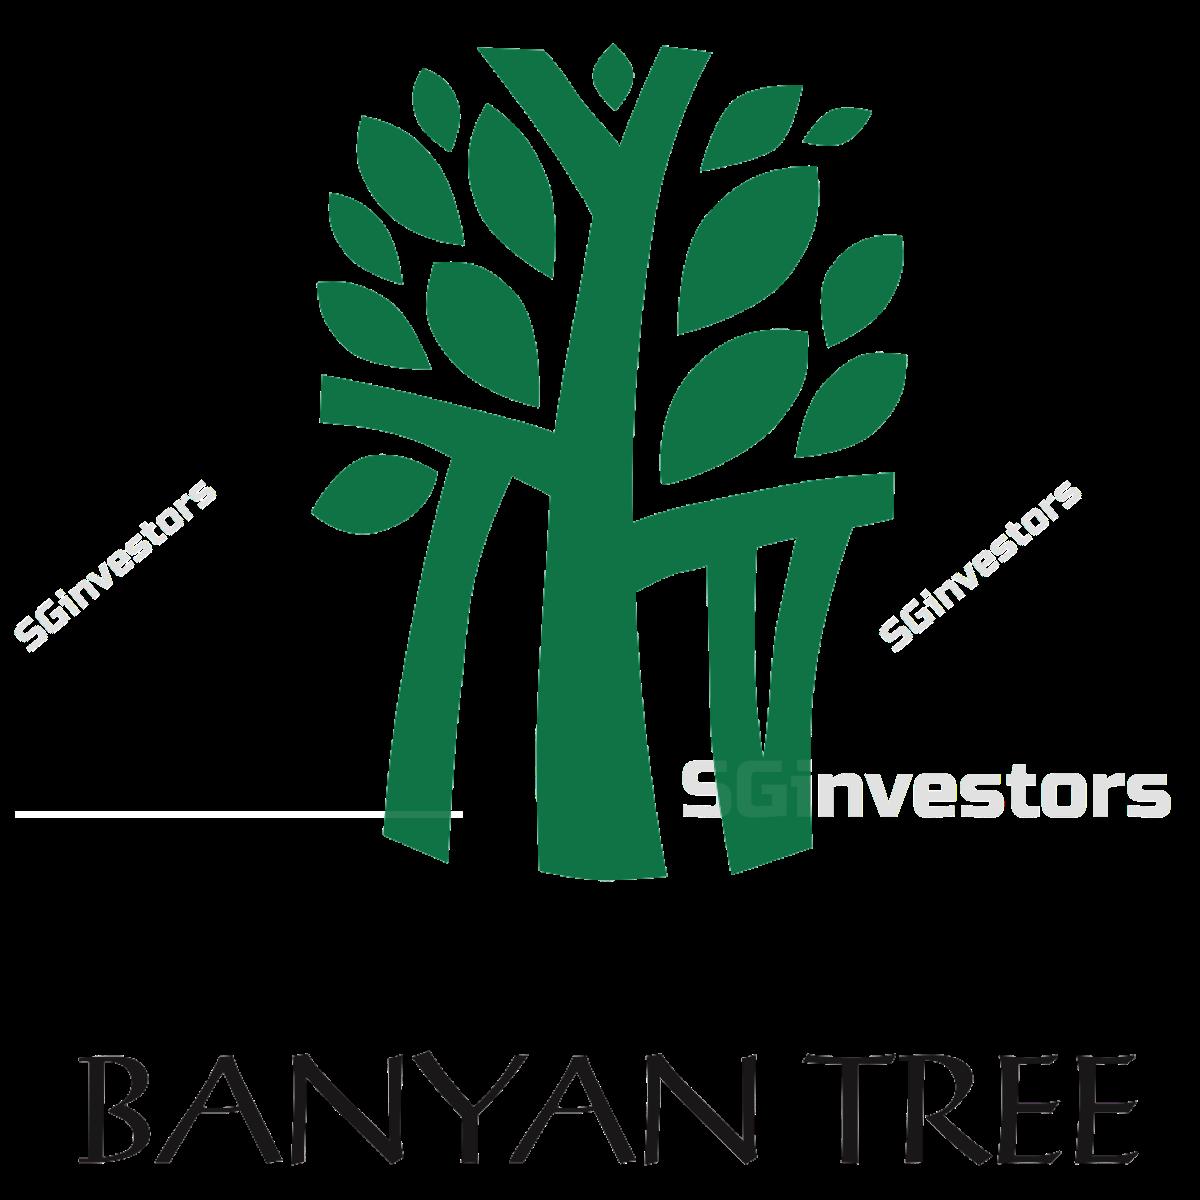 Banyan-Tree-Logo-Transparence-e1508810247134